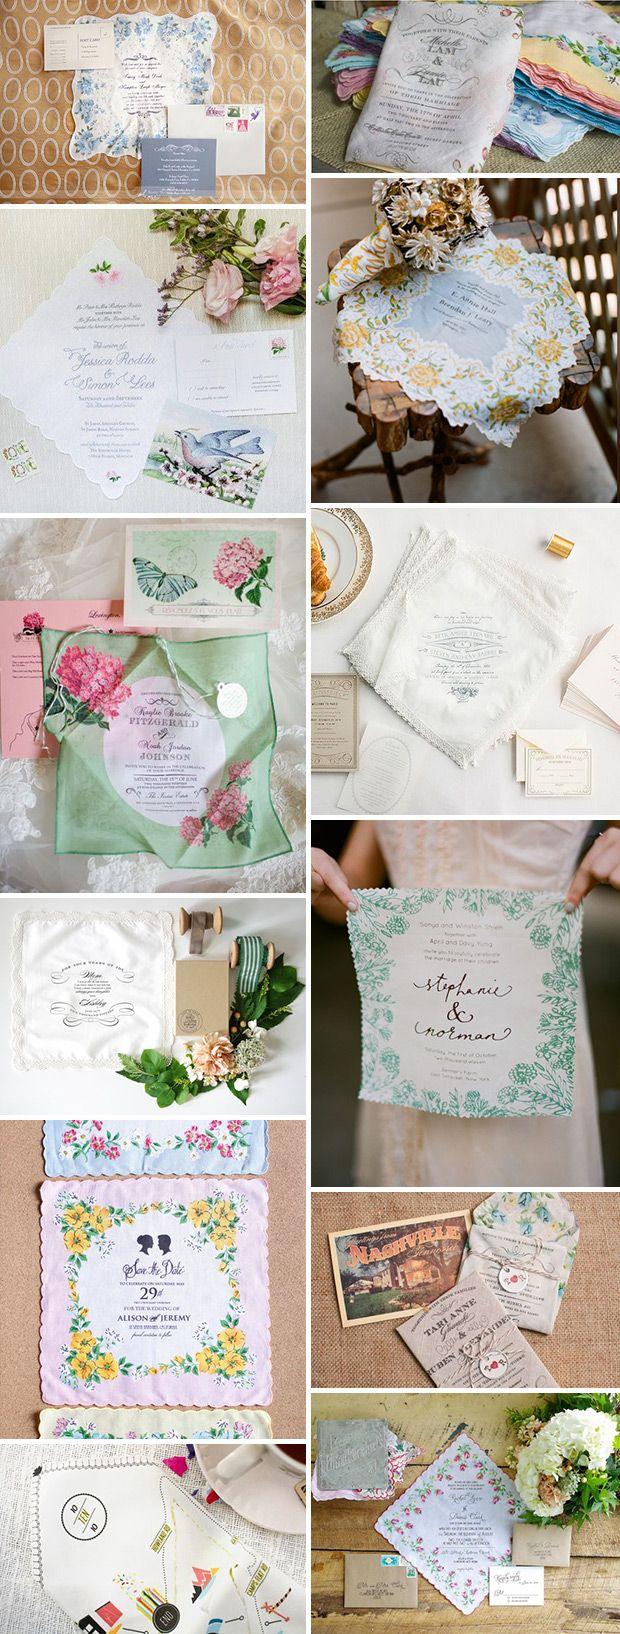 Keep sake Handkerchief Wedding Invitations | See more on www.onefabday.com